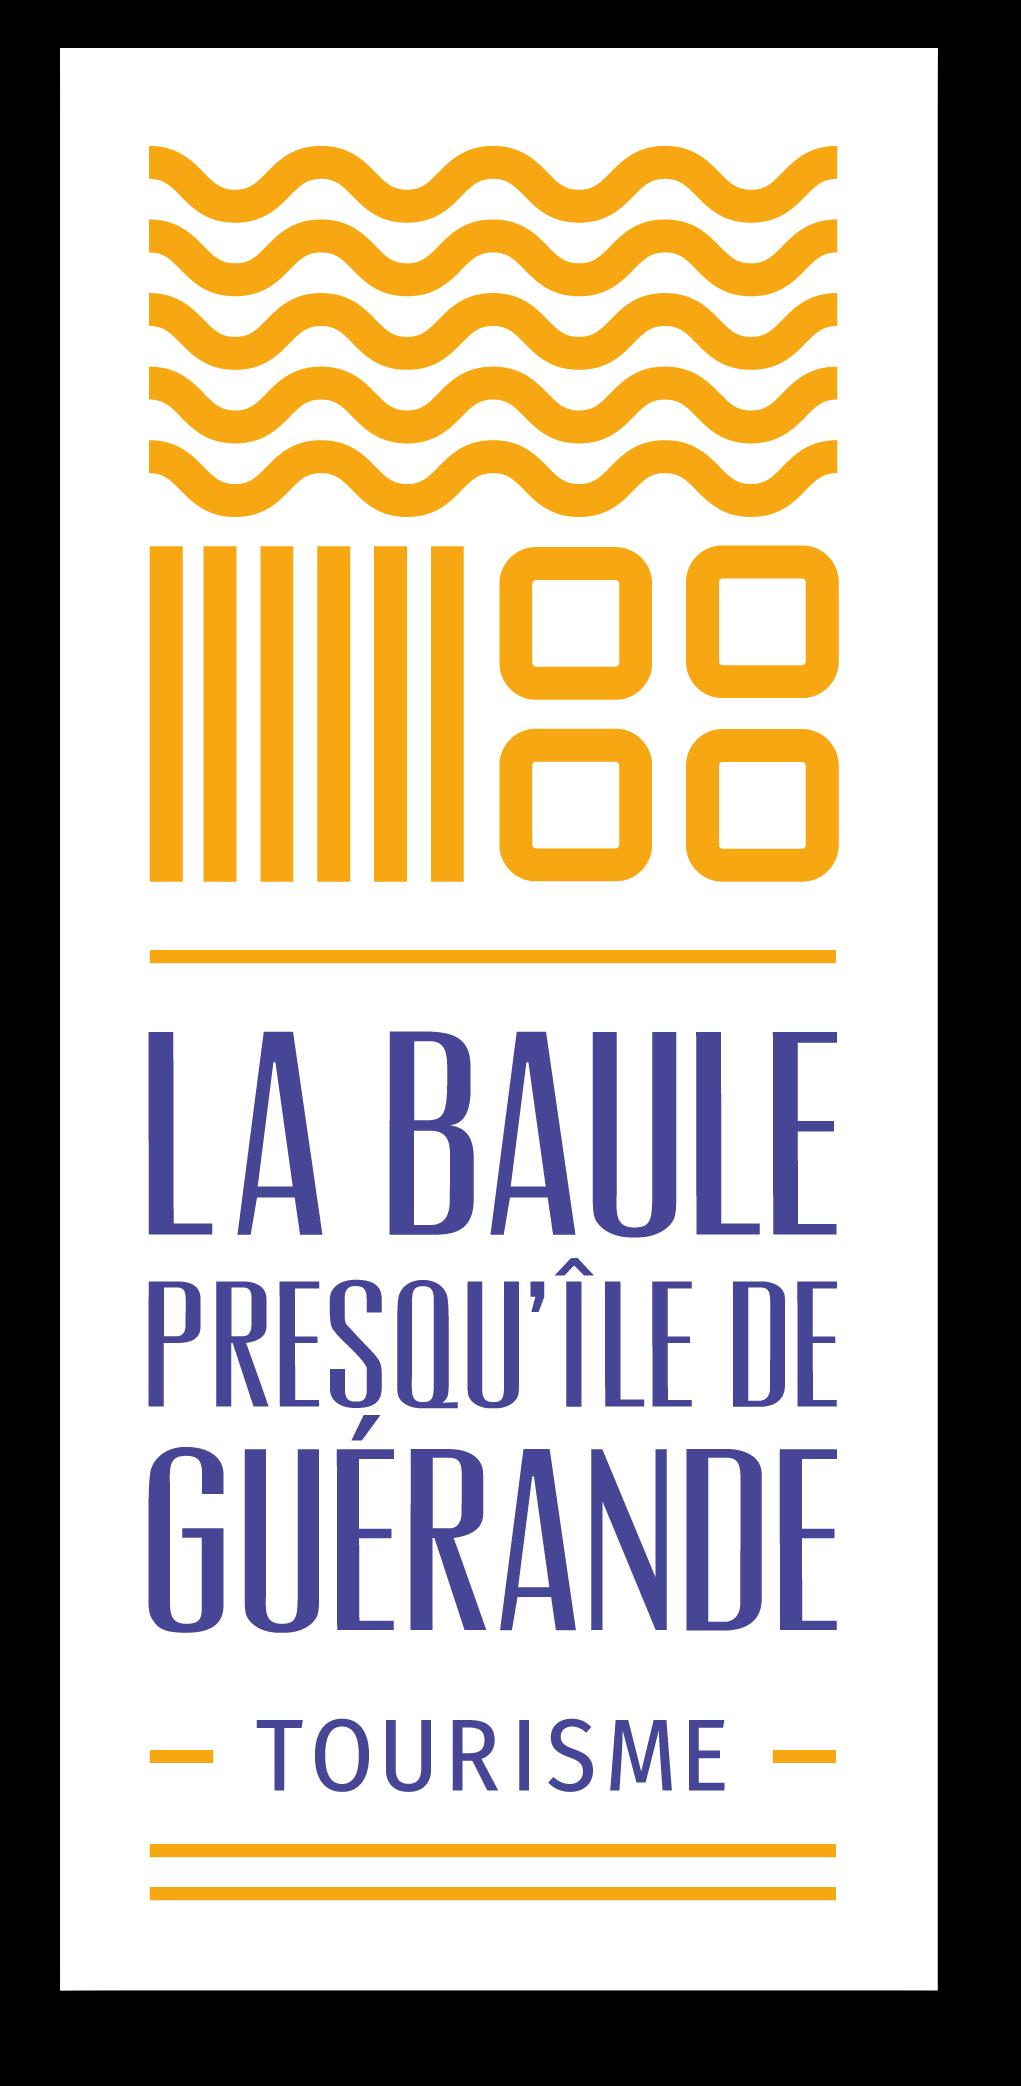 logo_soleil_ombre_la_baule_presqu_ile_de_guerande